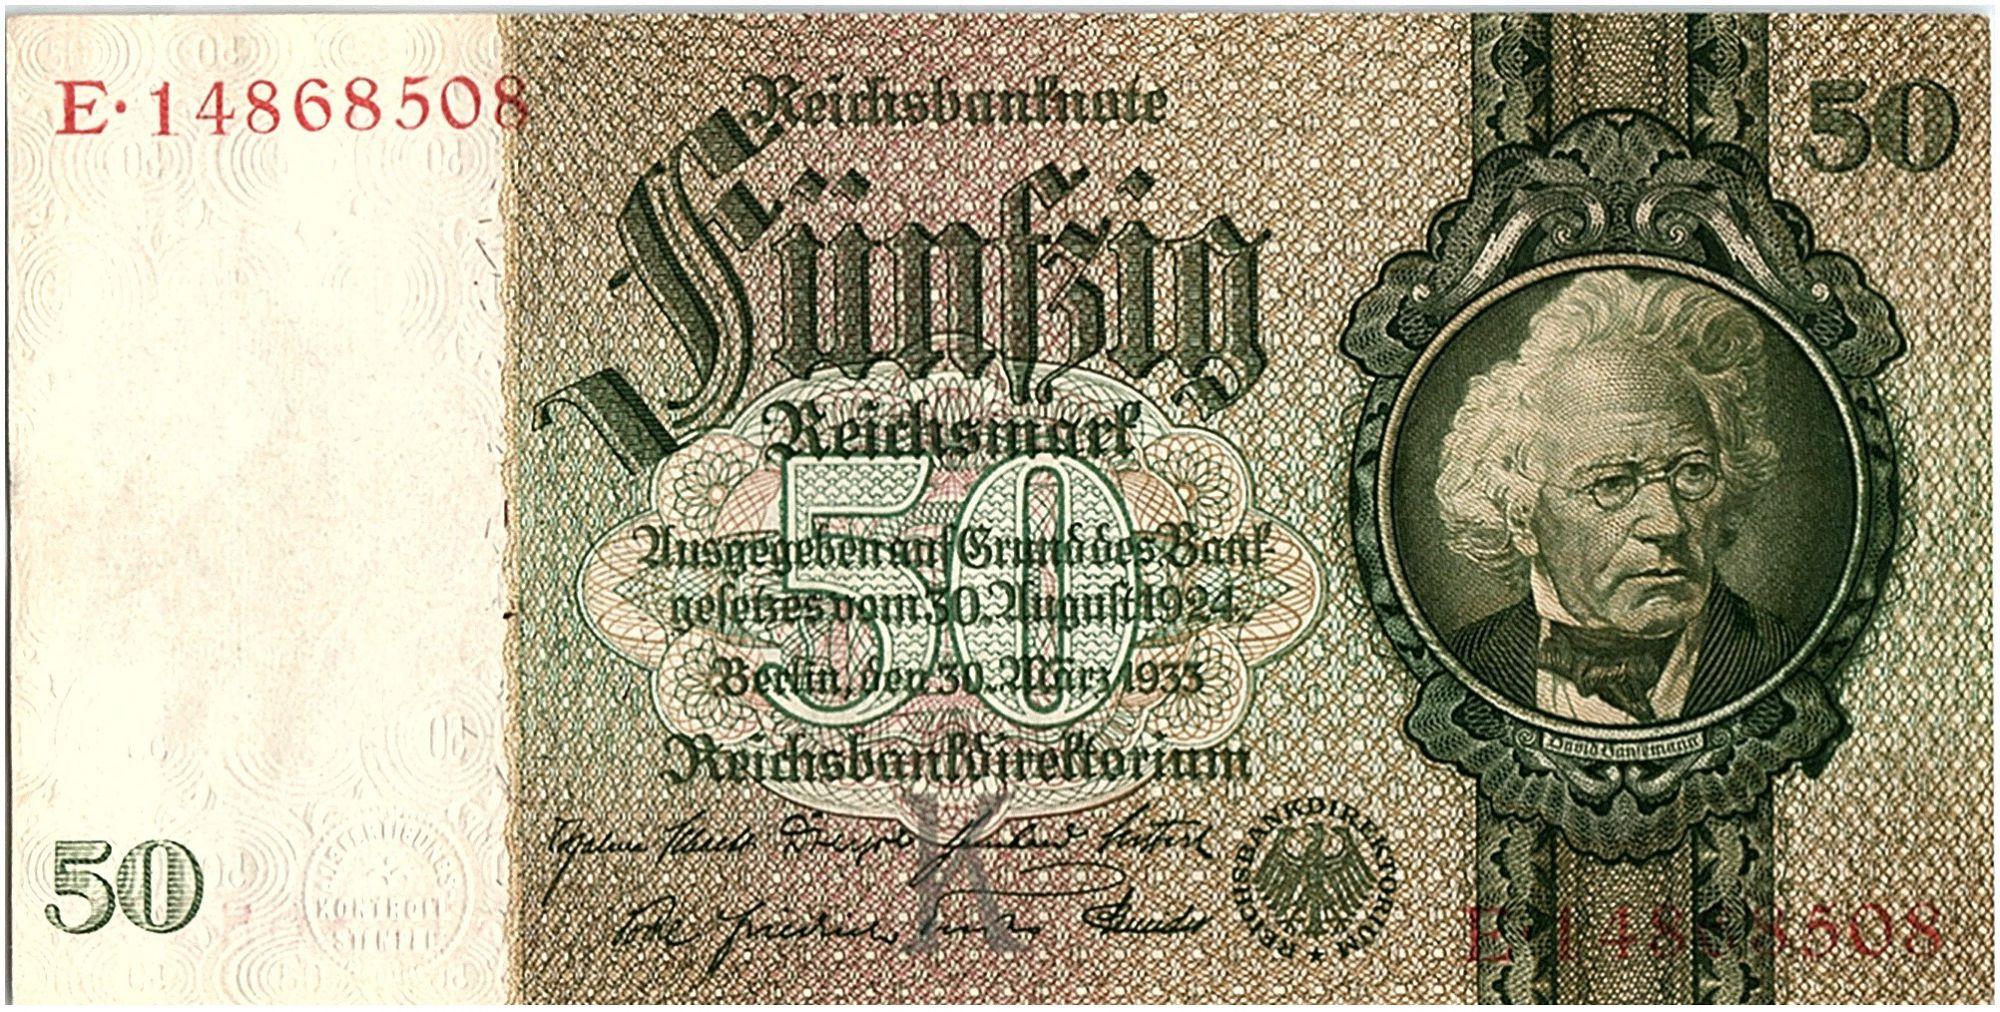 Allemagne 50 Reichsmark 1933 - Série E - XF - P.182